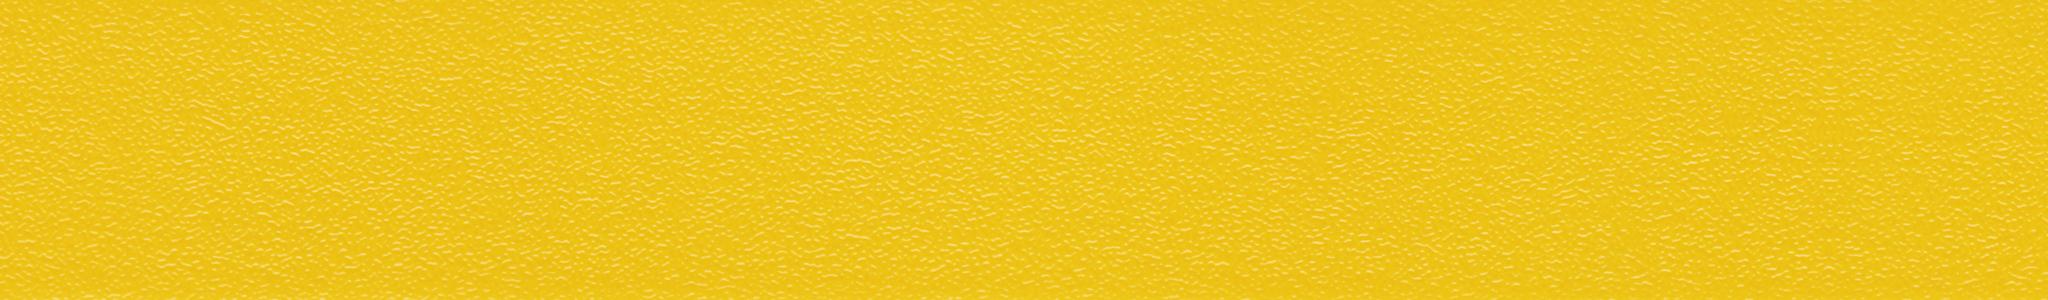 HU 110131 ABS-rand geel parel 101